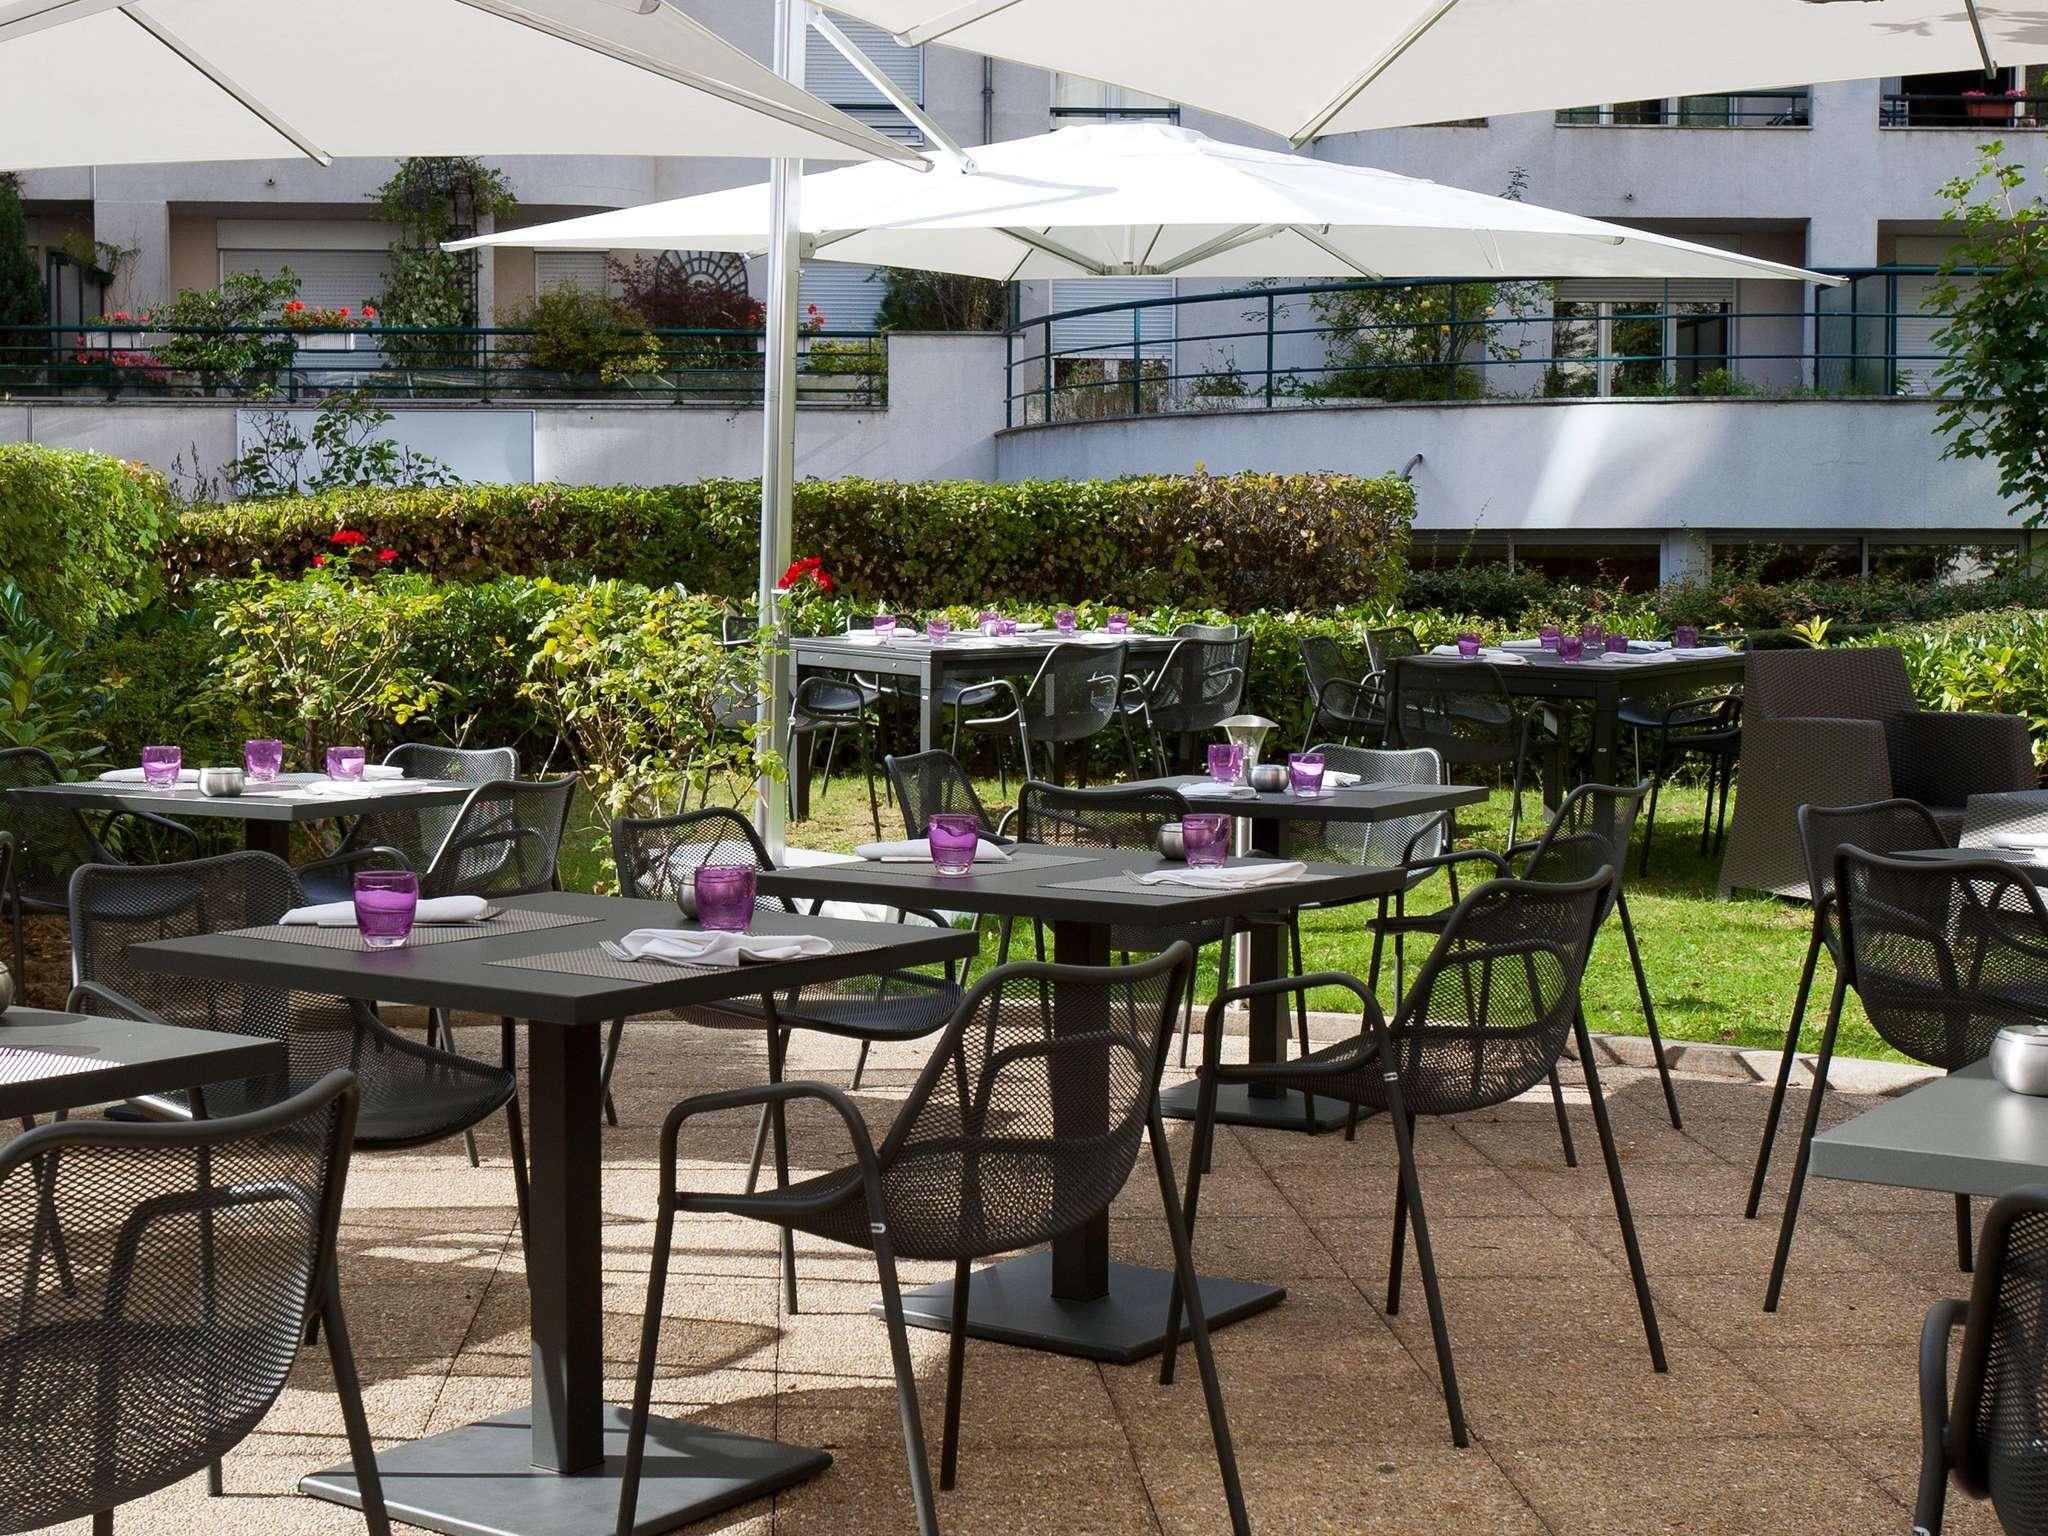 Hotel – Novotel Parijs Charenton